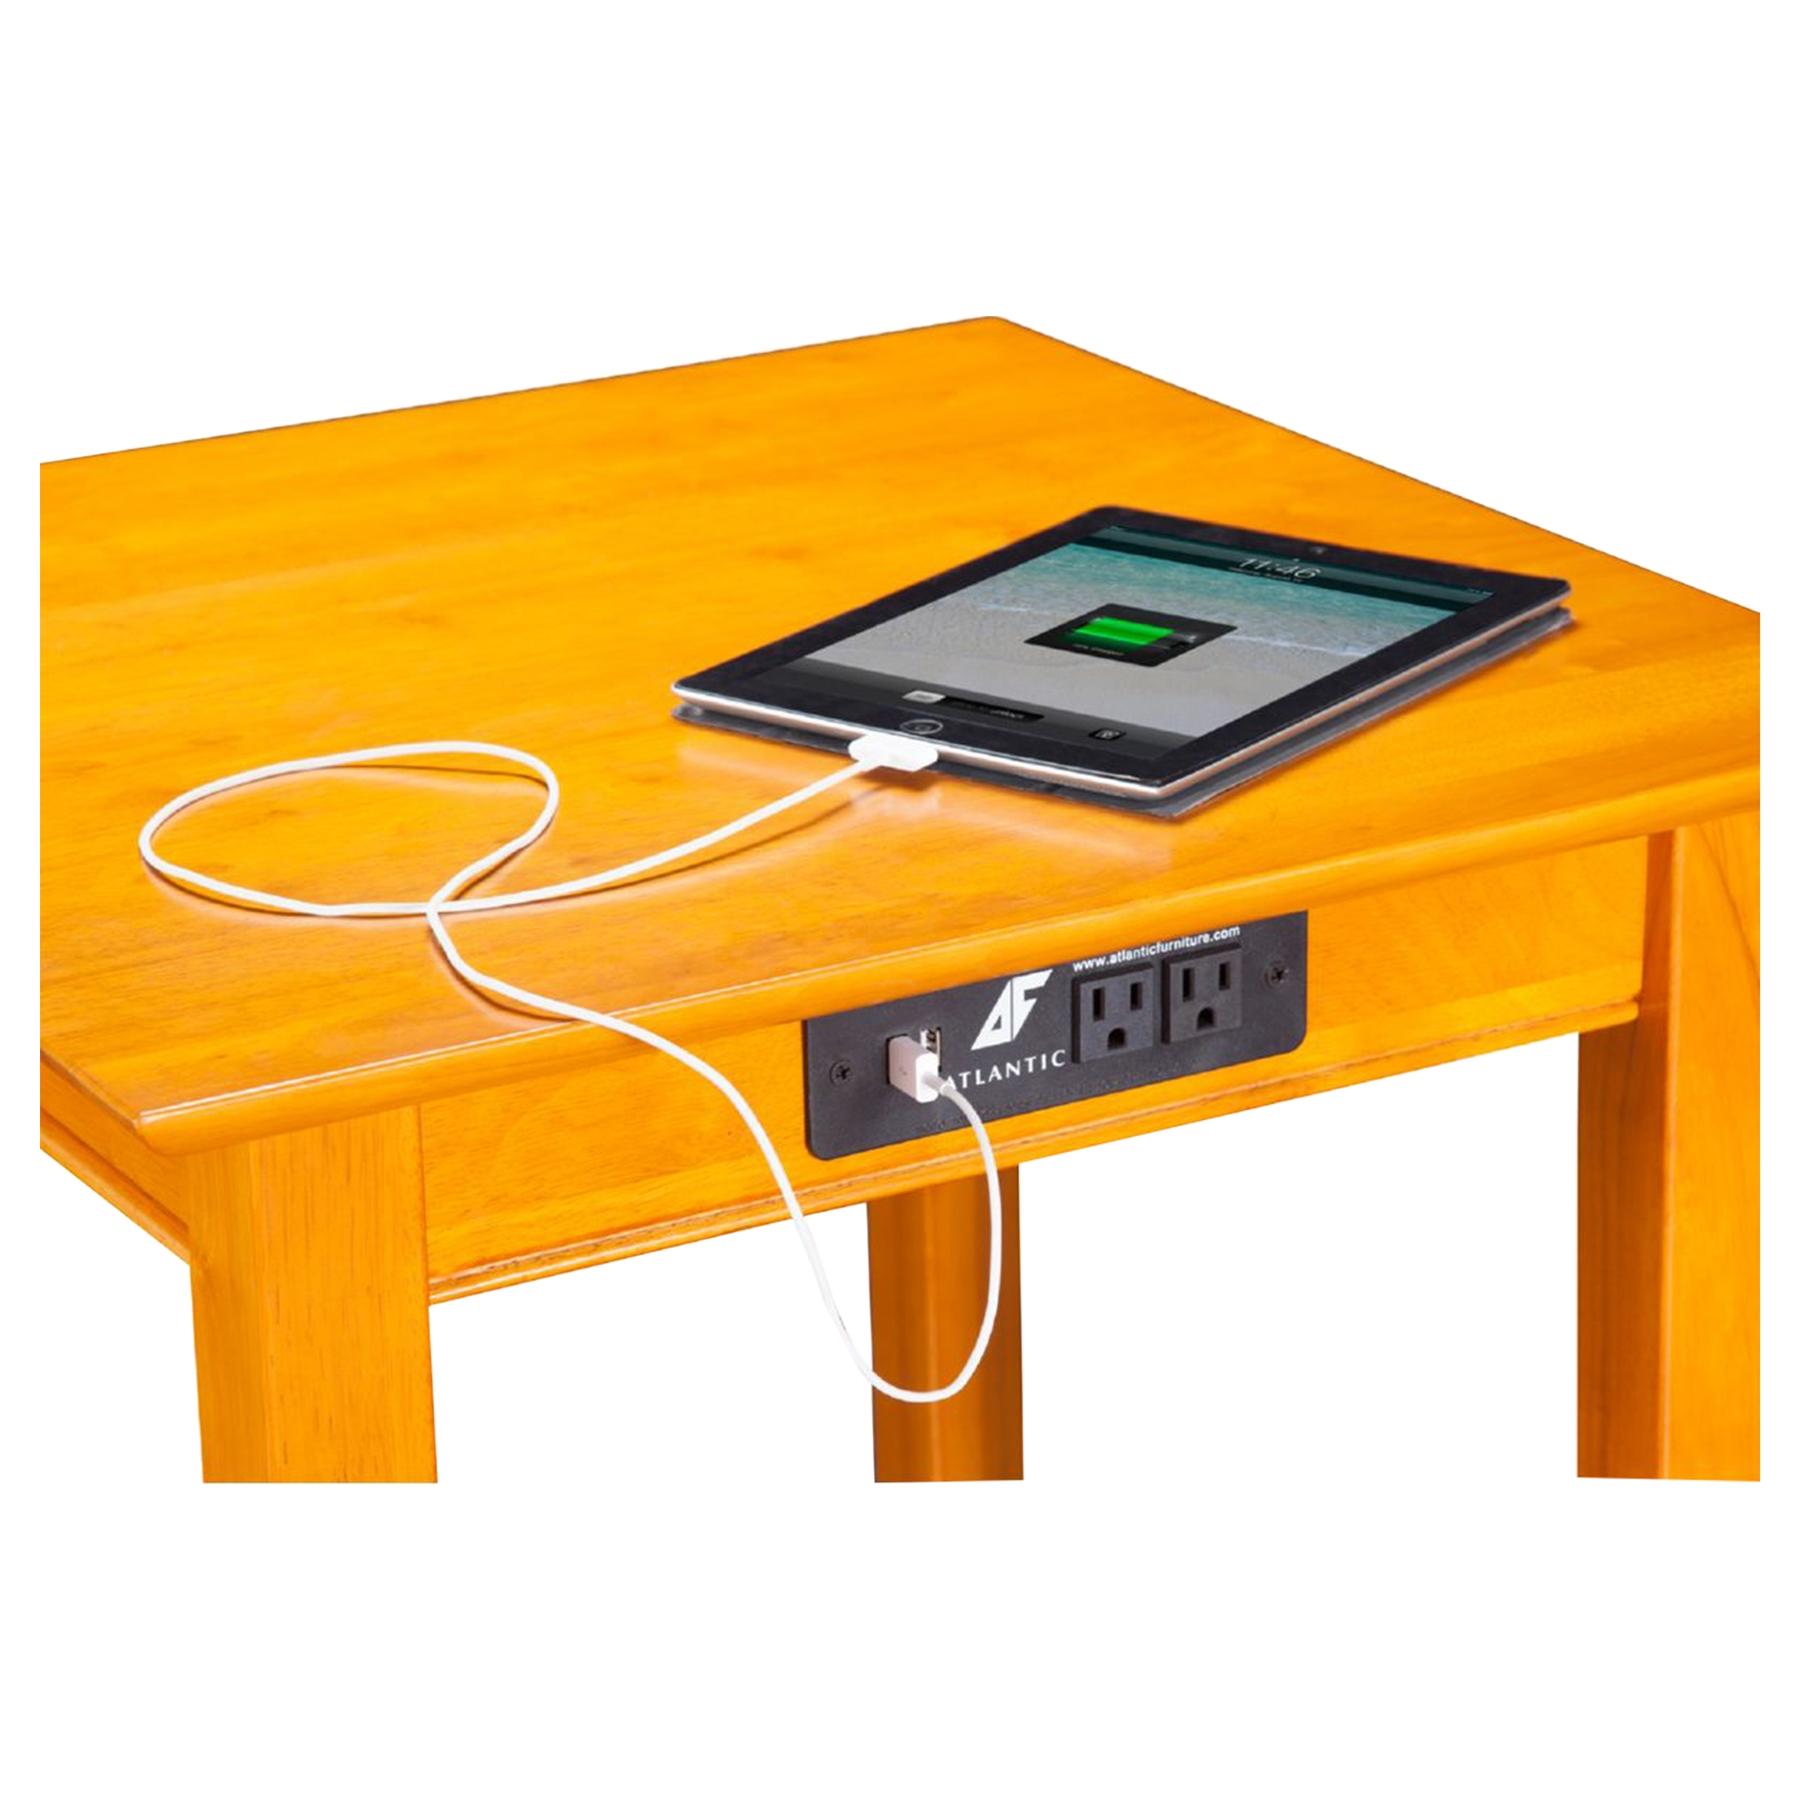 ... Shaker Printer Stand   Charging Station   ATL AH1011